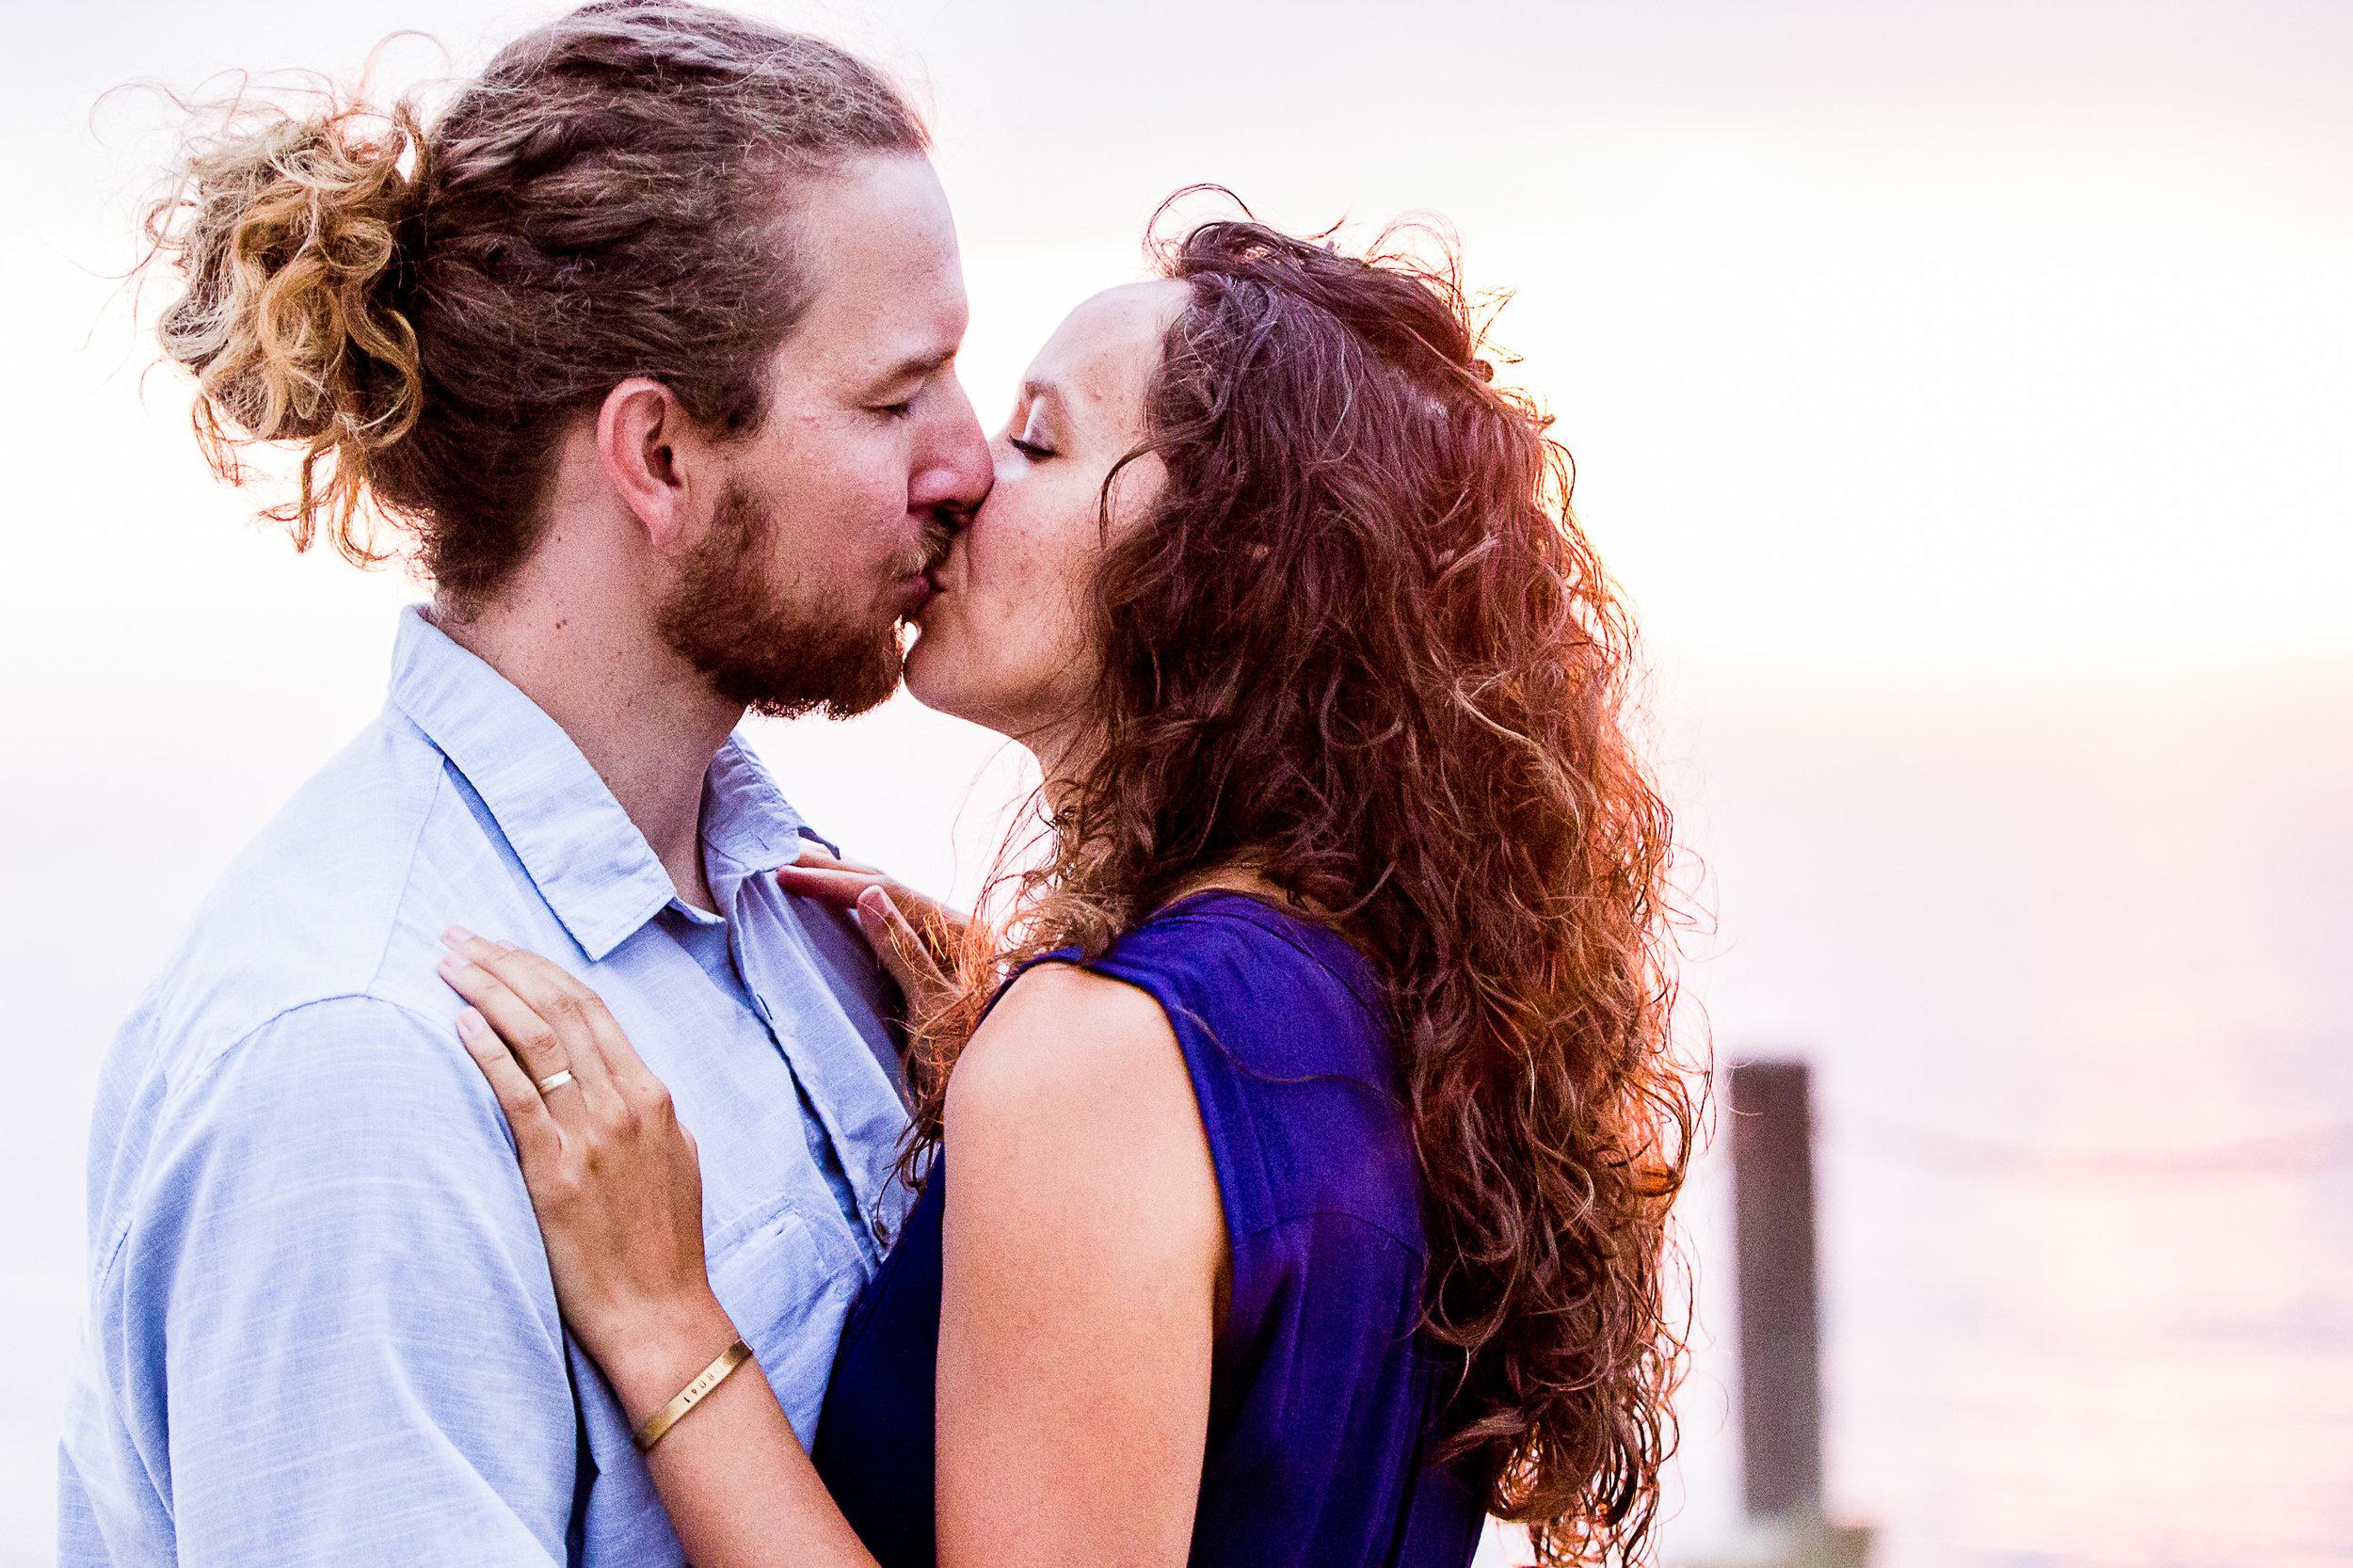 la-jolla-glider-point-torrey-pines-anniversary-session-true-loves-kiss-san-diego-photographer-sophia-elizabeth (176 of 181).jpg